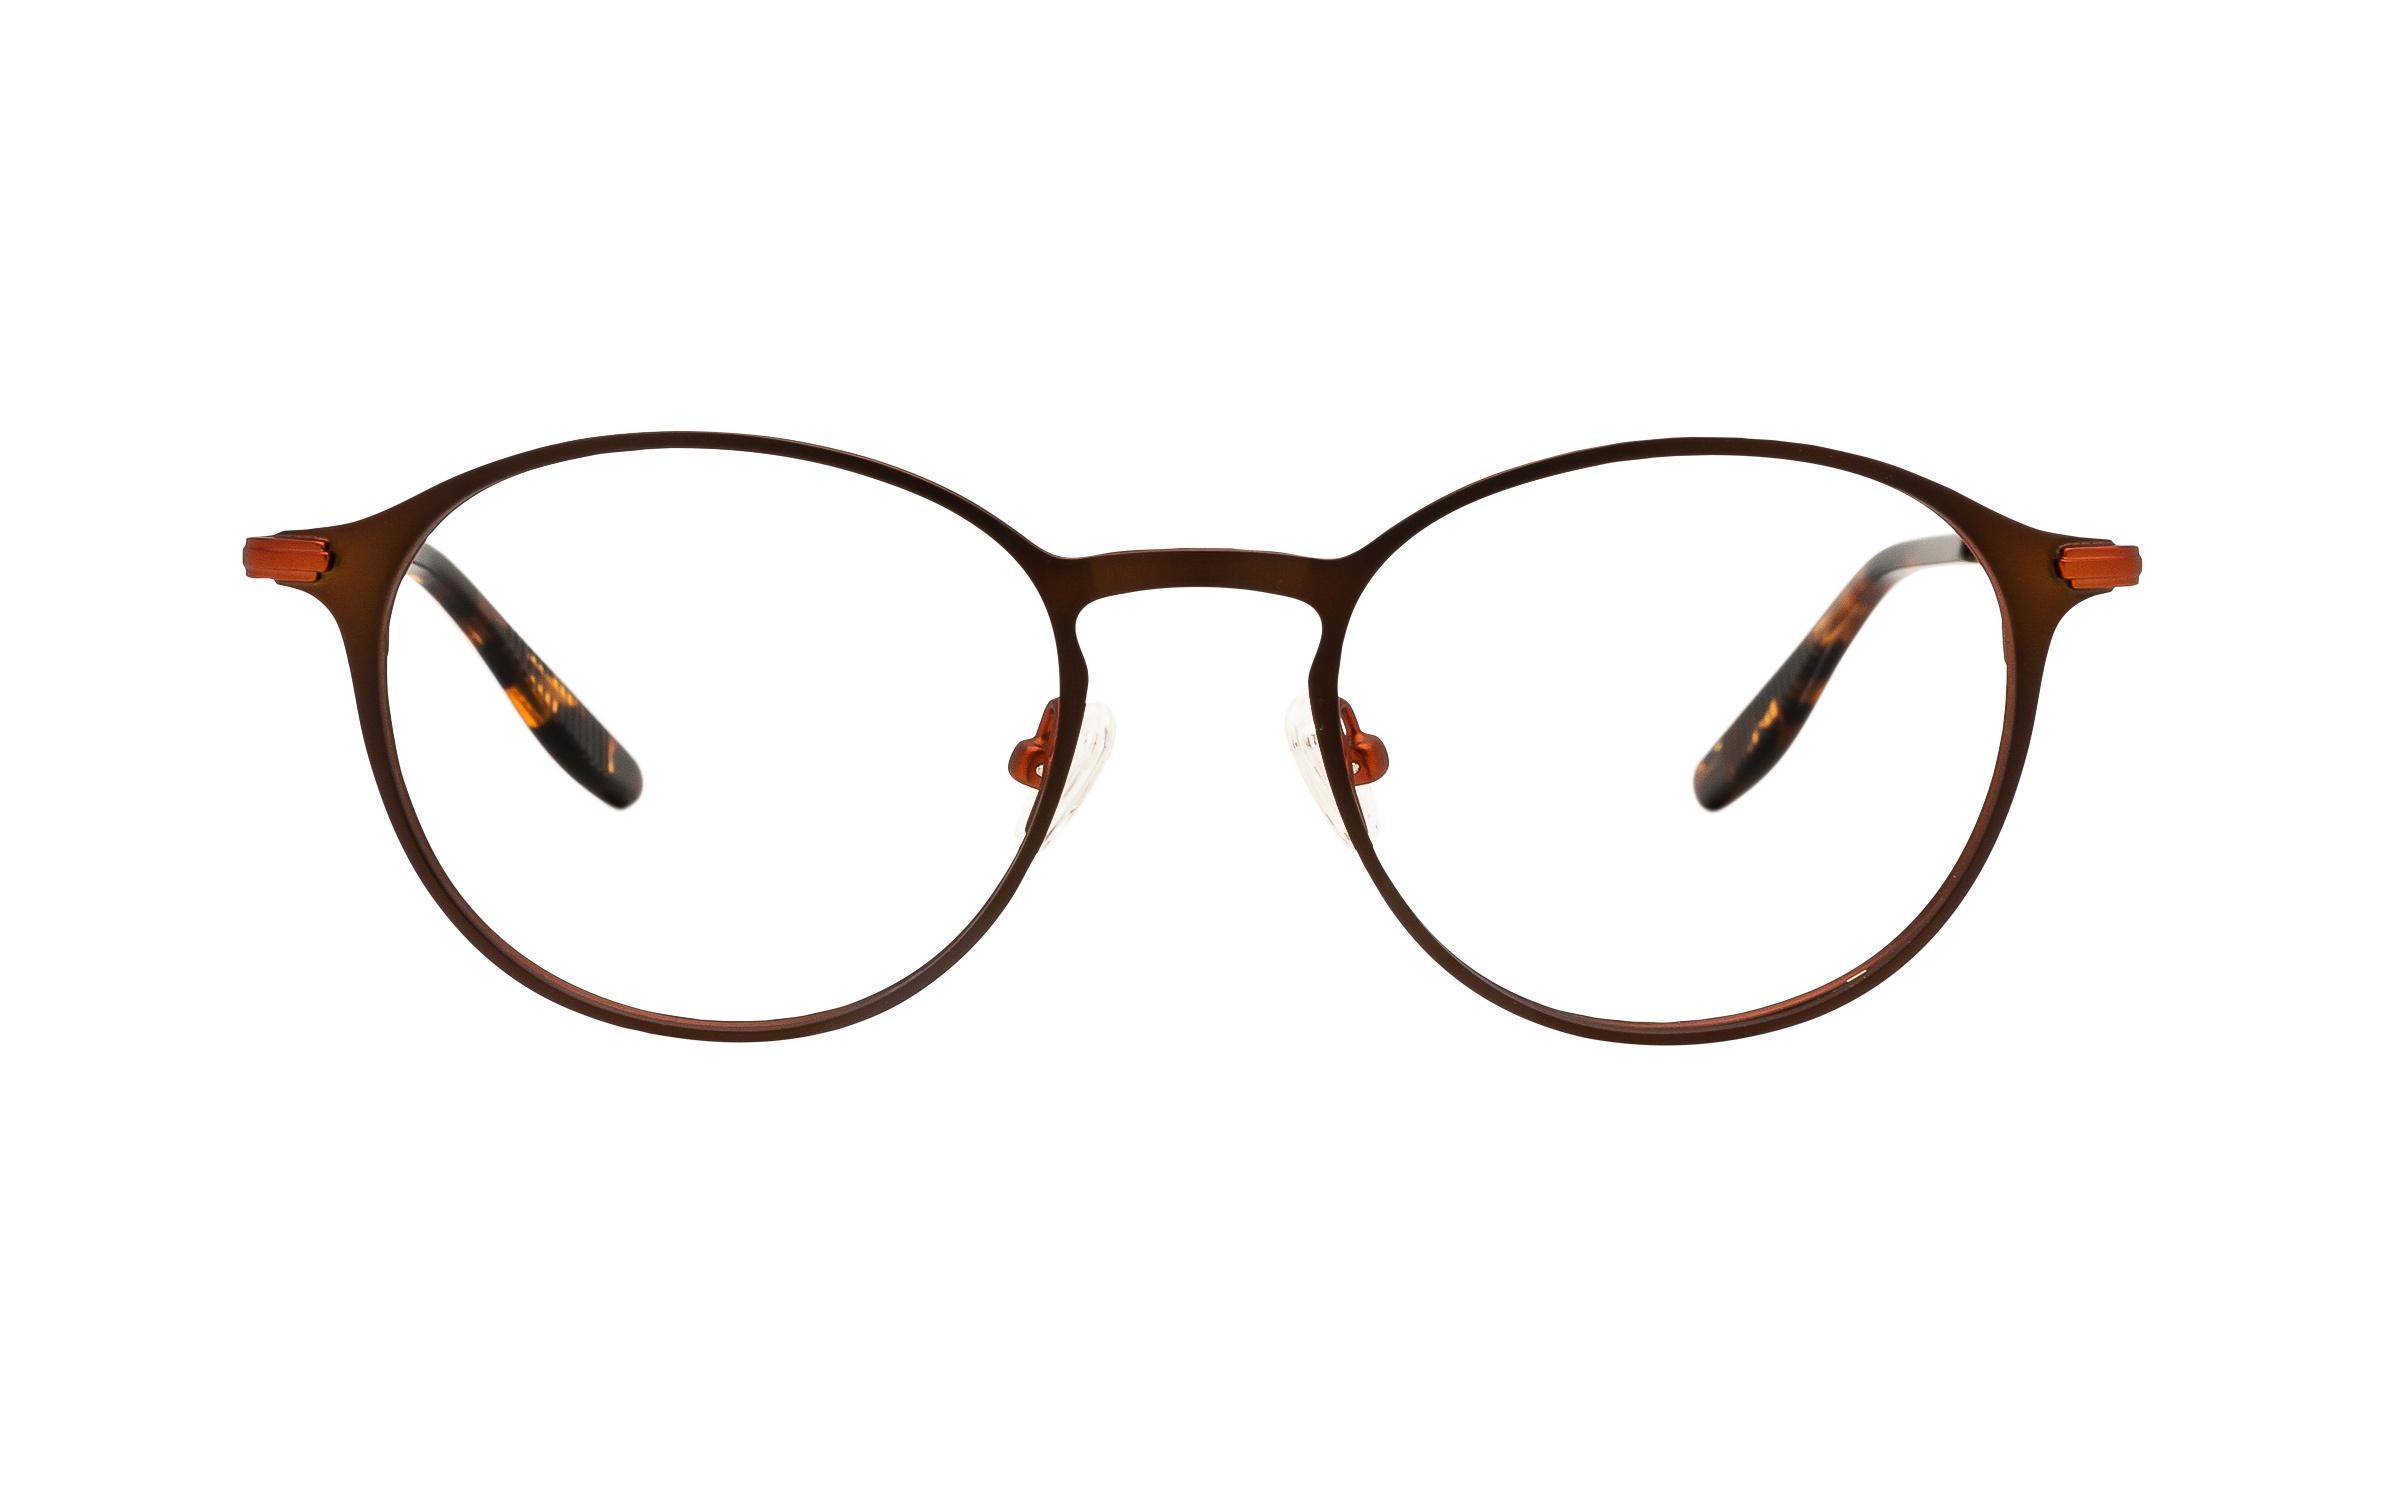 Joseph Marc Avila JM059 C03 (50) Eyeglasses and Frame in Matte Brown | Metal - Online